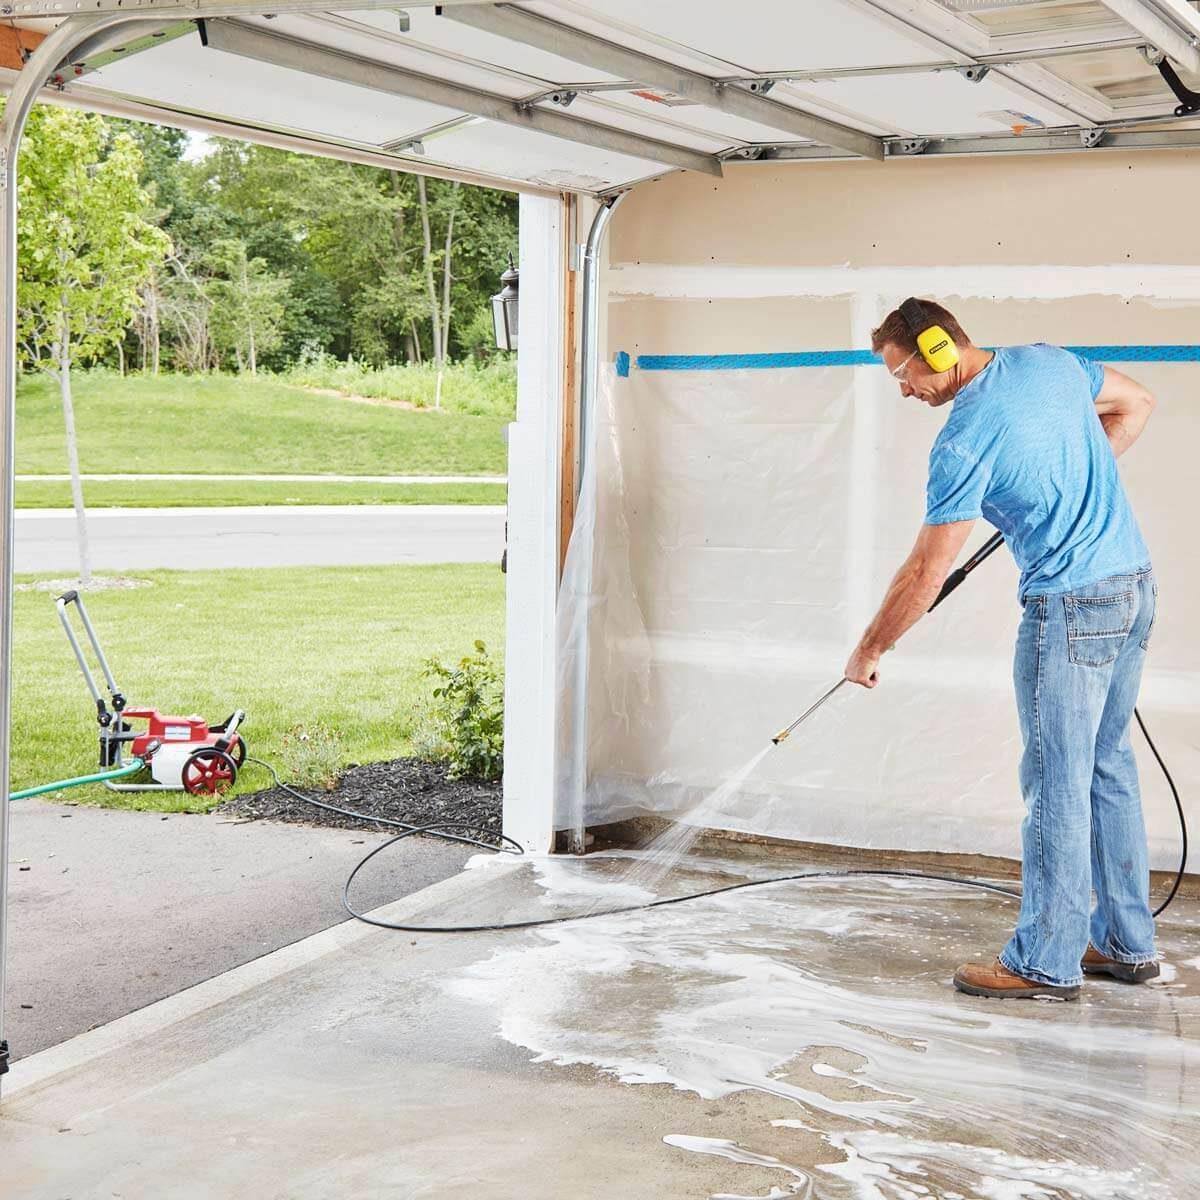 FH17ONO_582_06_033 power wash garage floor